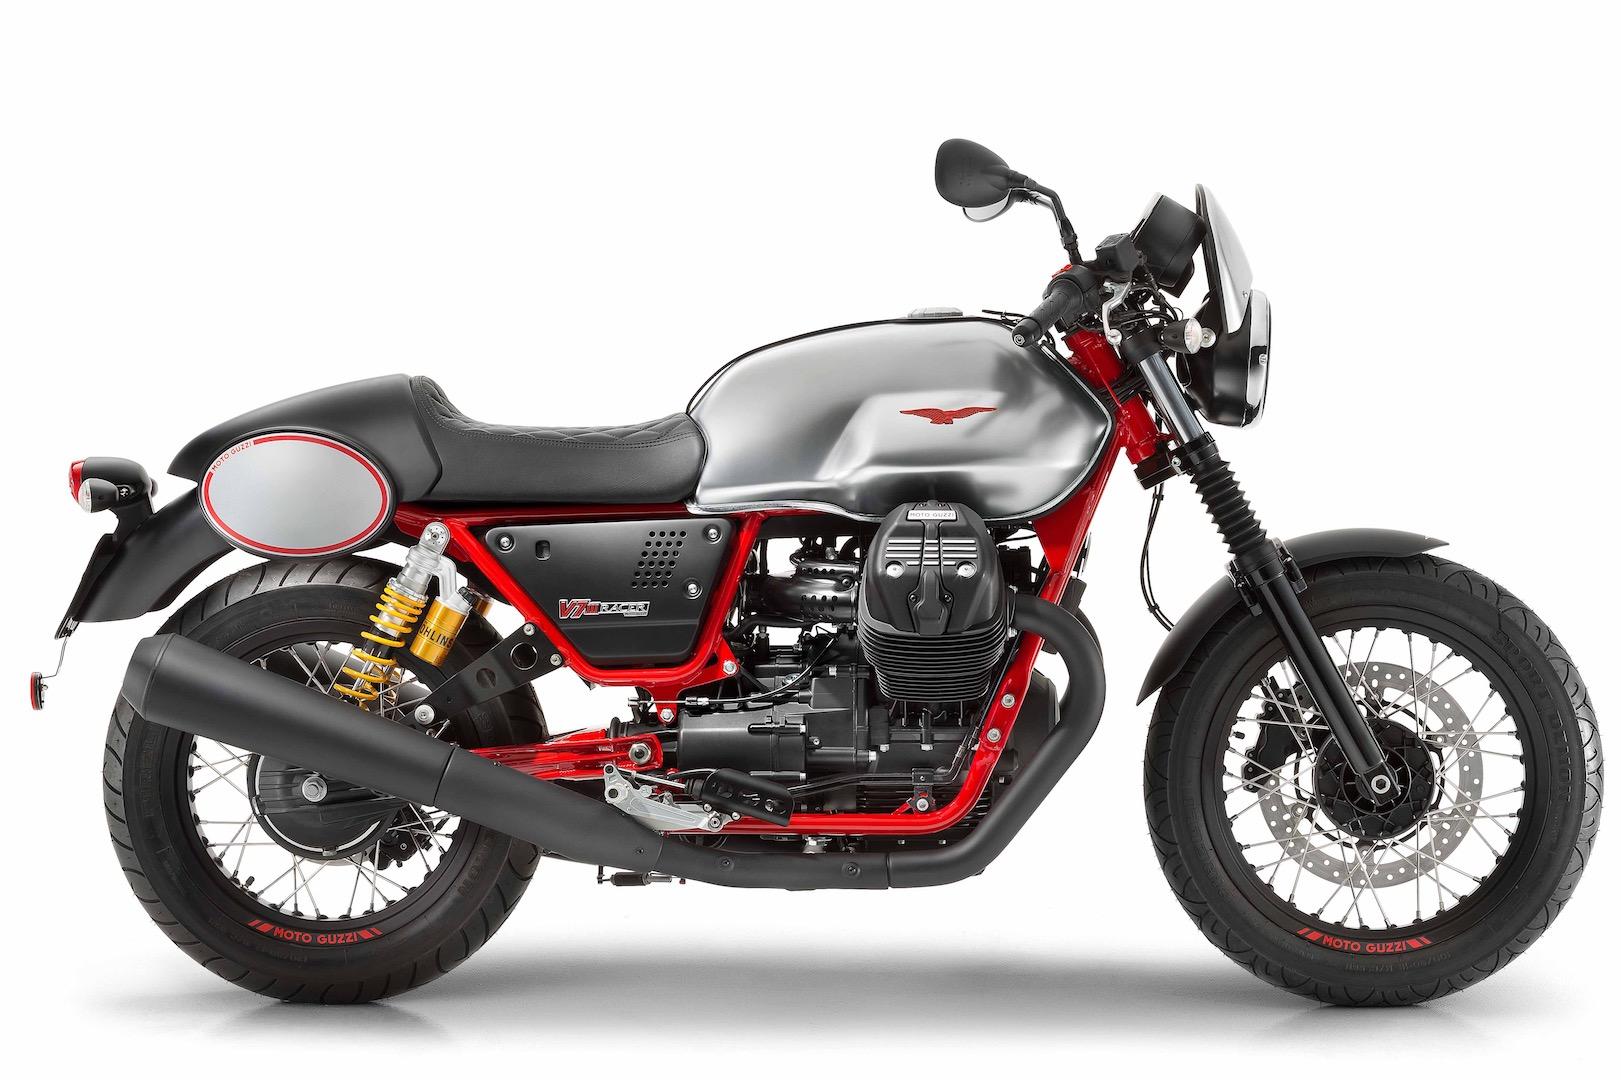 2017-Moto-Guzzi-V7-III-Racer-Review